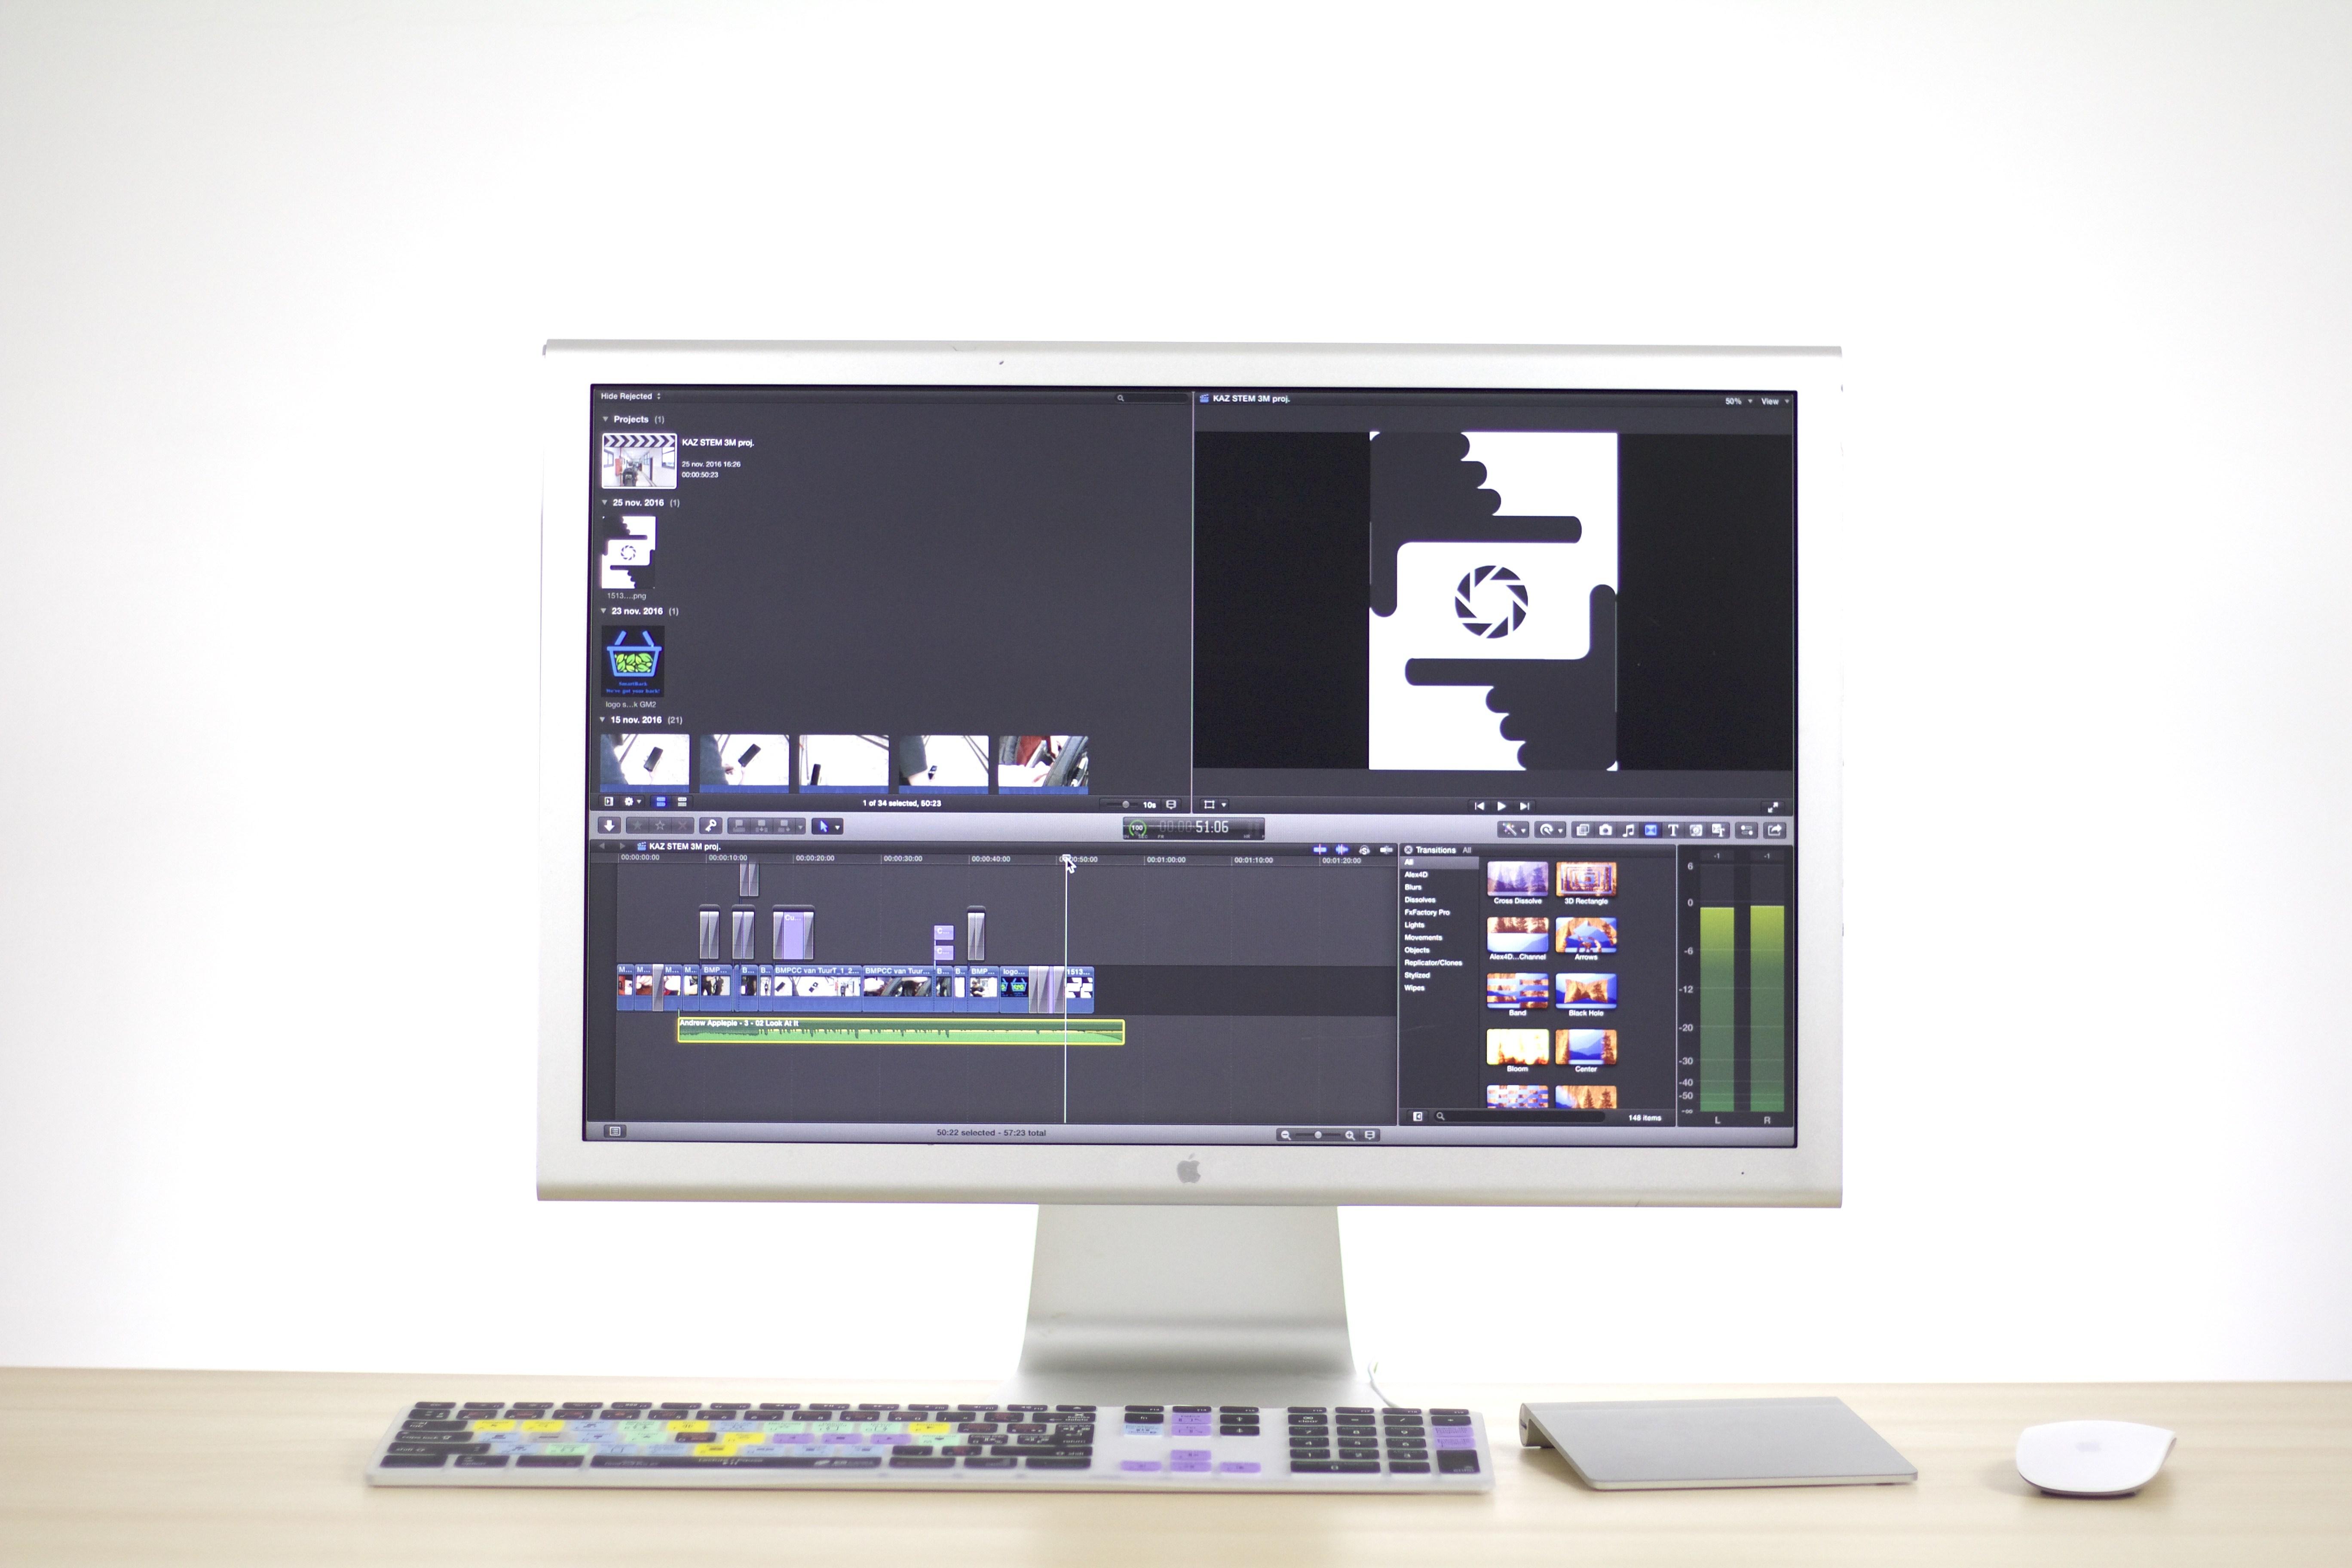 video quality loss